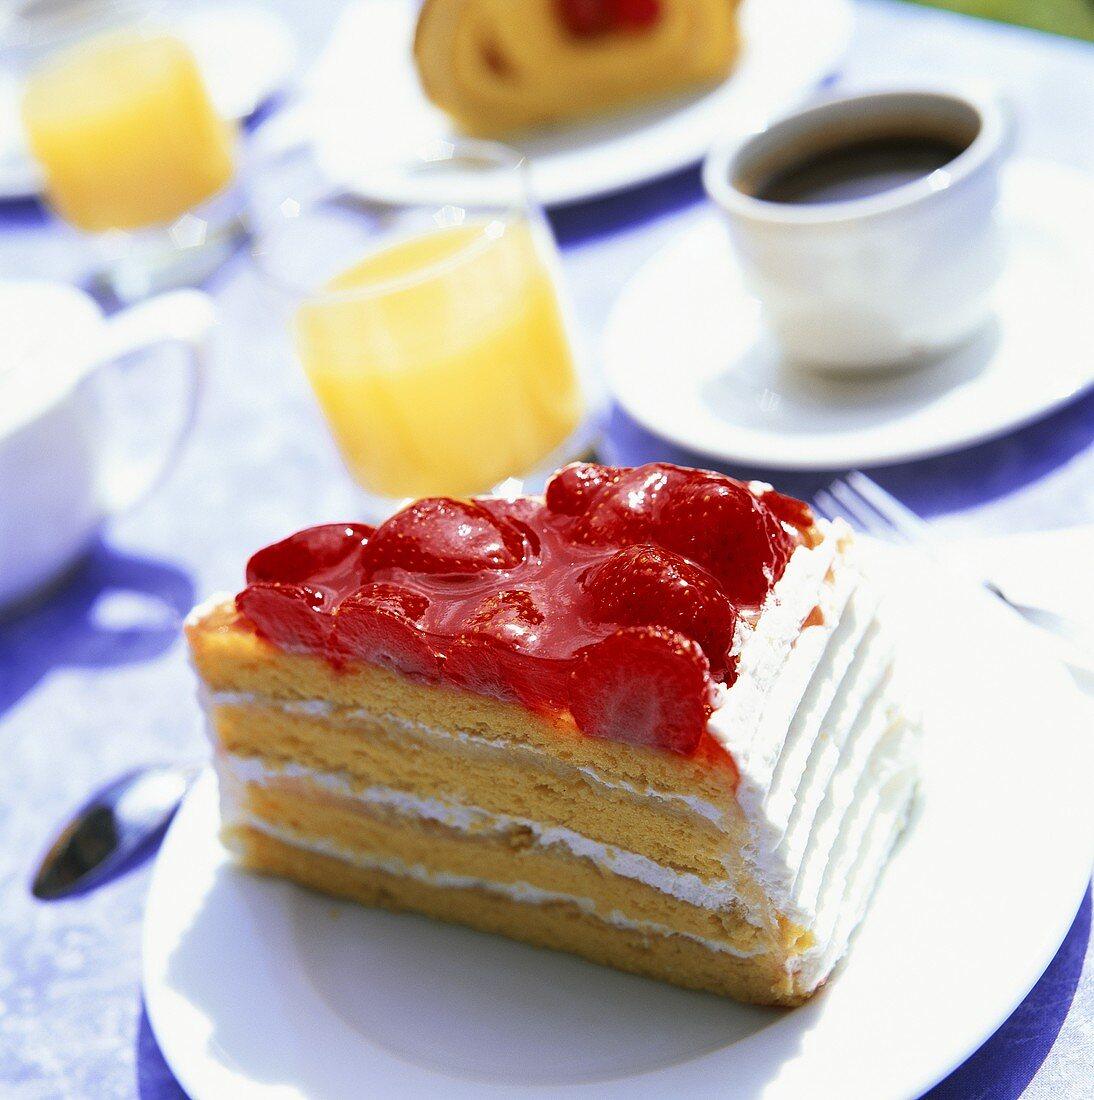 Piece of strawberry gateau, coffee & orange juice on table